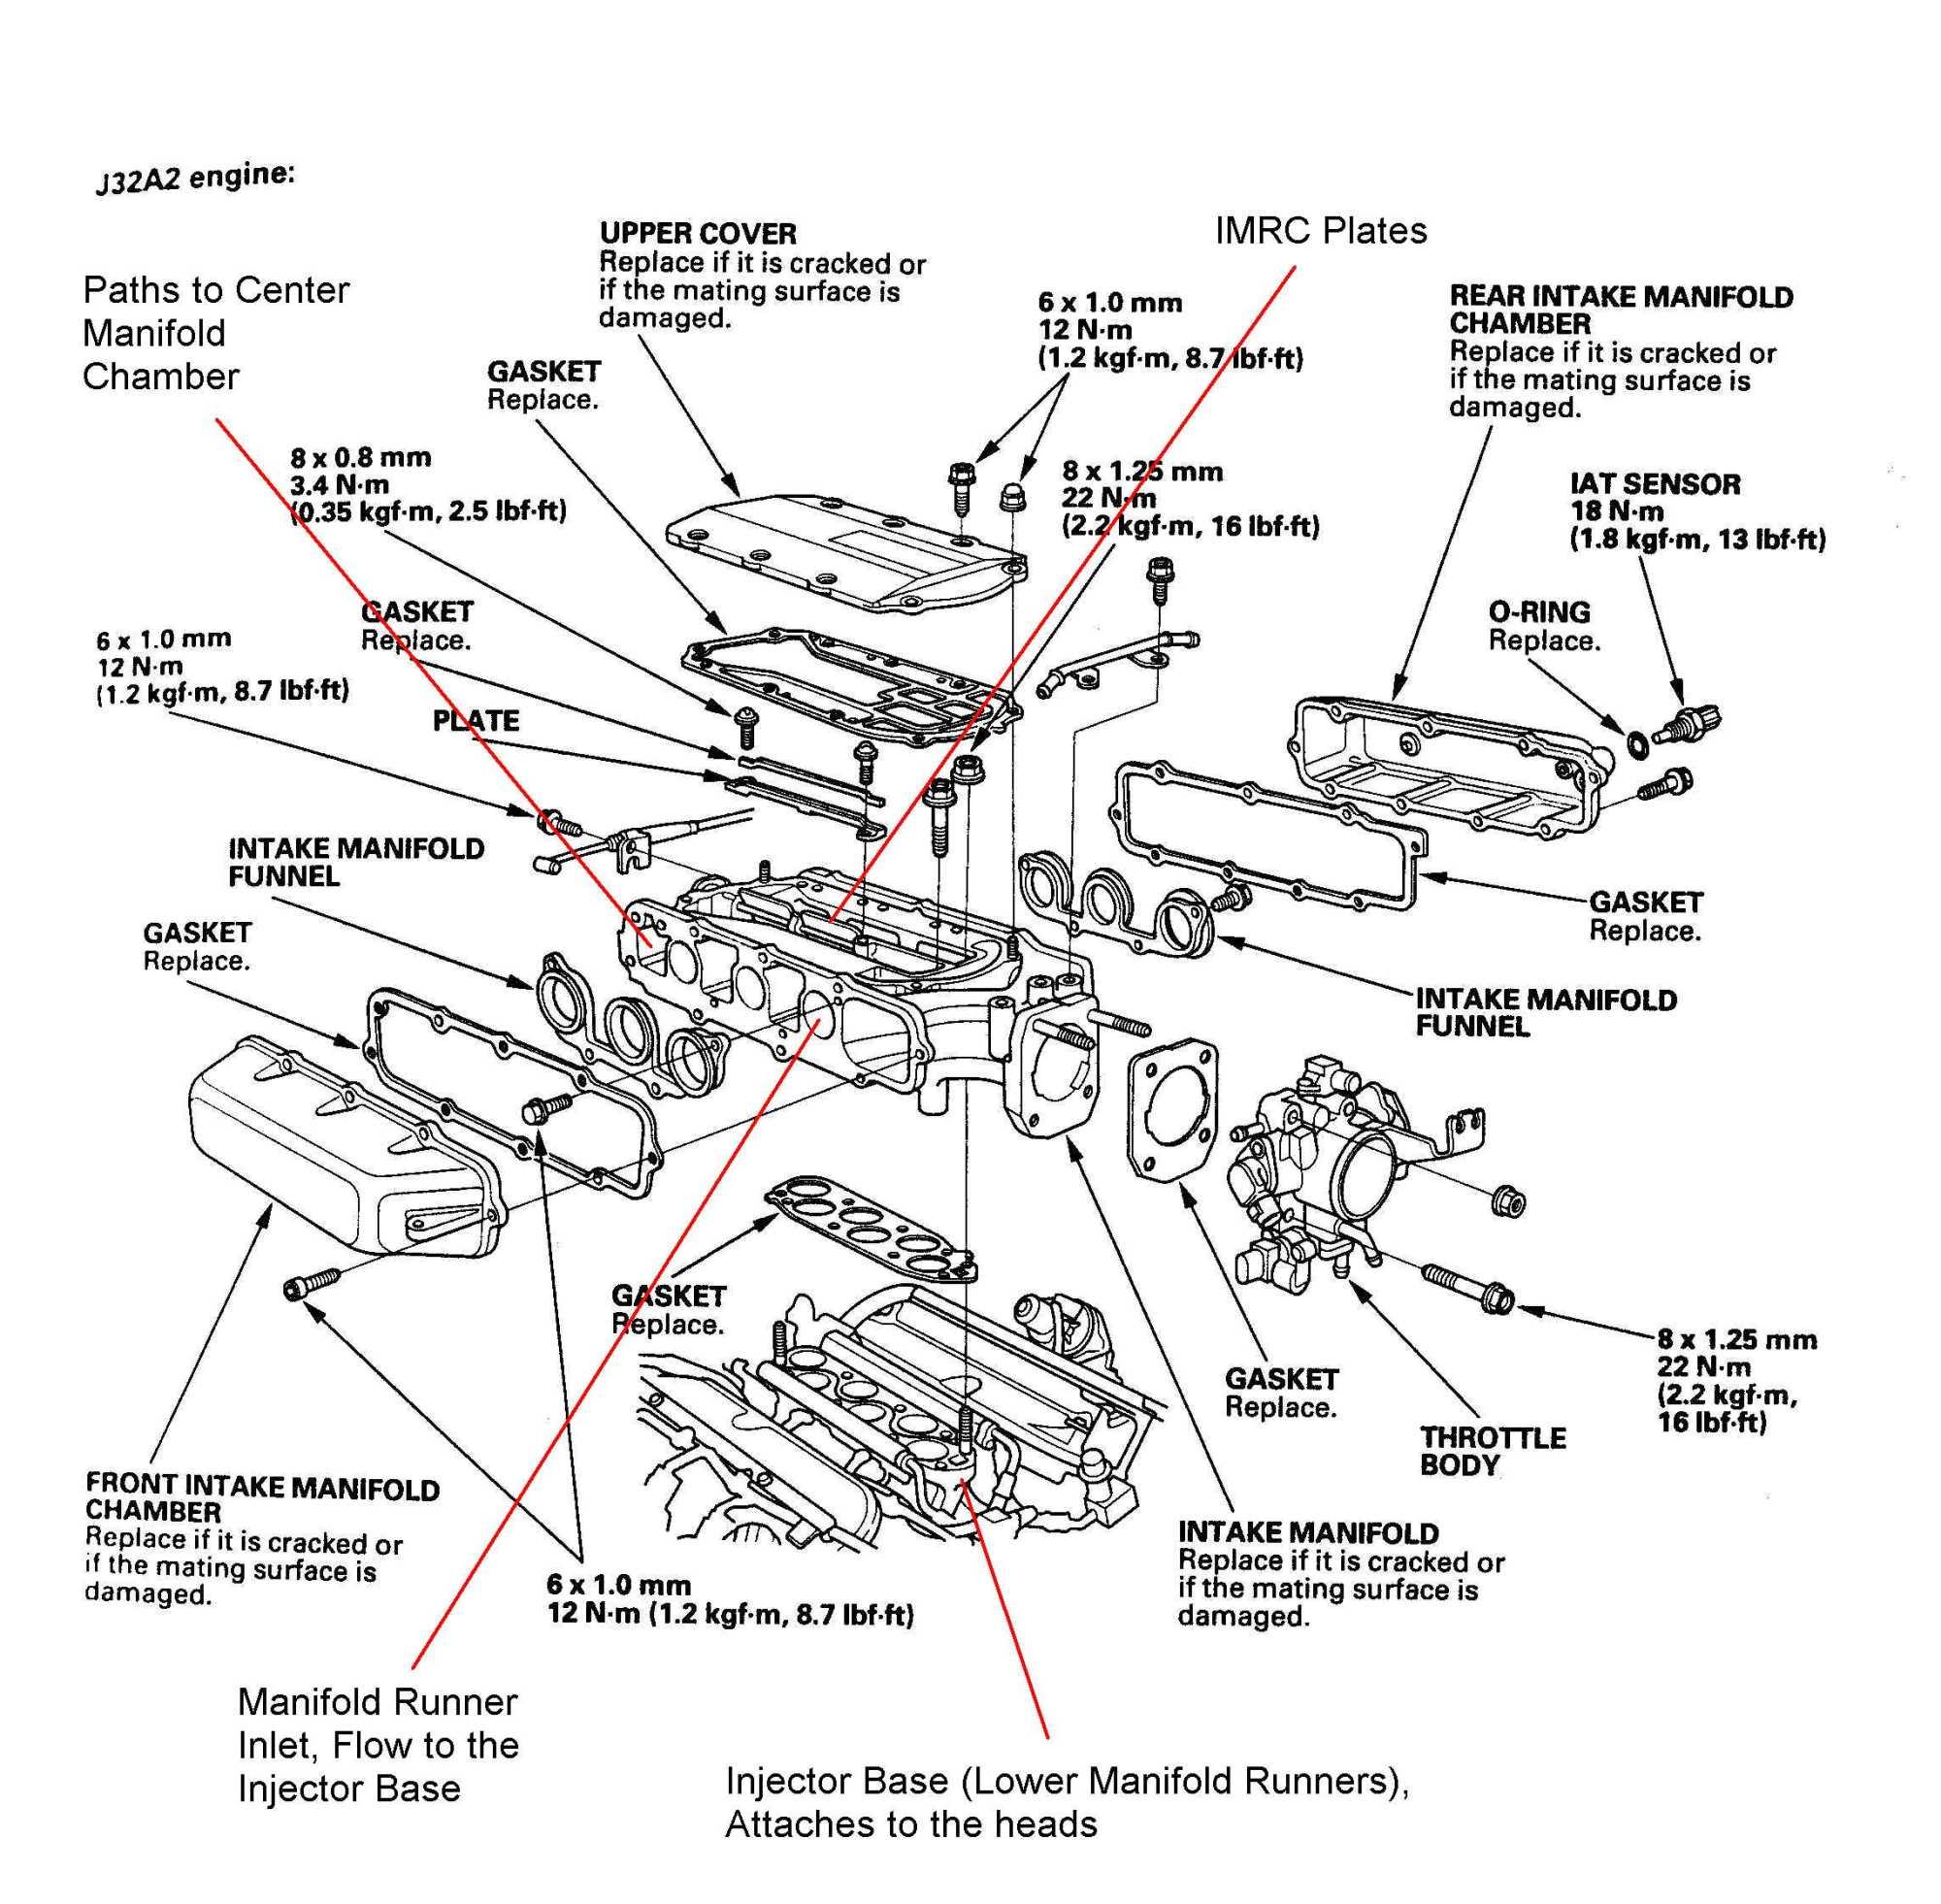 hight resolution of 1999 acura tl engine diagram wiring diagram third level rh 13 2 11 jacobwinterstein com ford 7 3 powerstroke ford 7 3 sensor locations